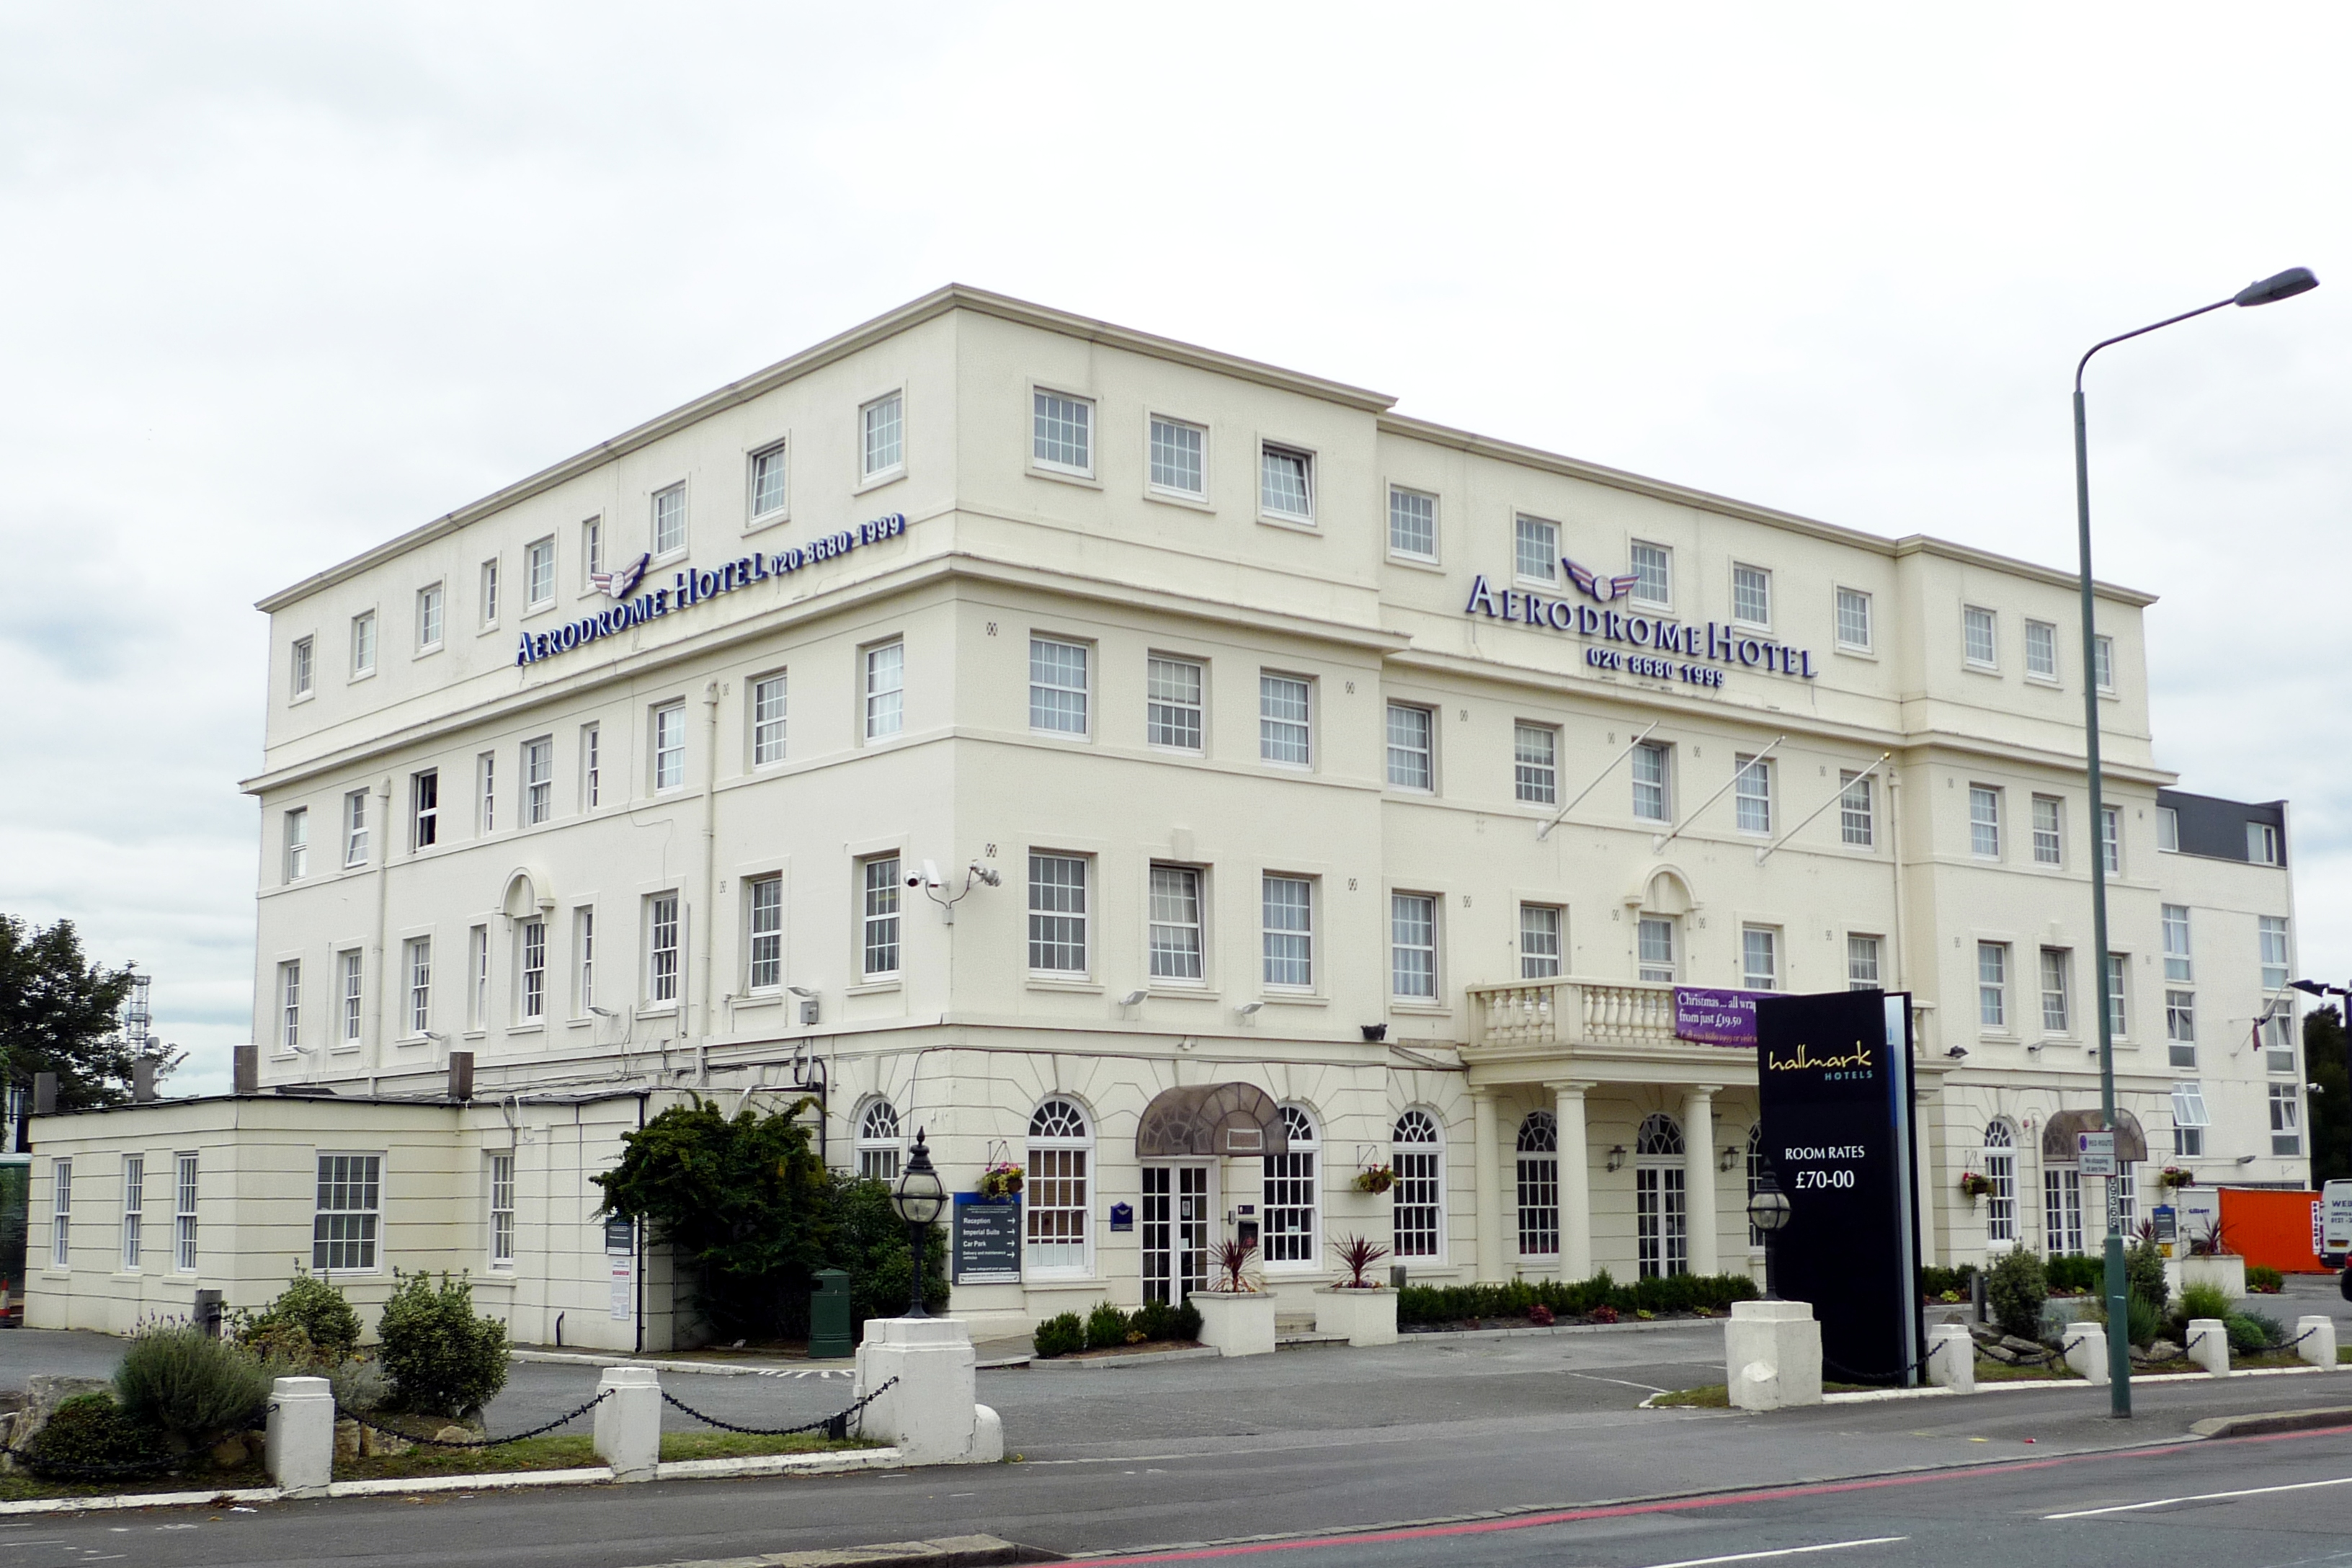 Croydon Park Hotel Croydon Vereinigtes Konigreich